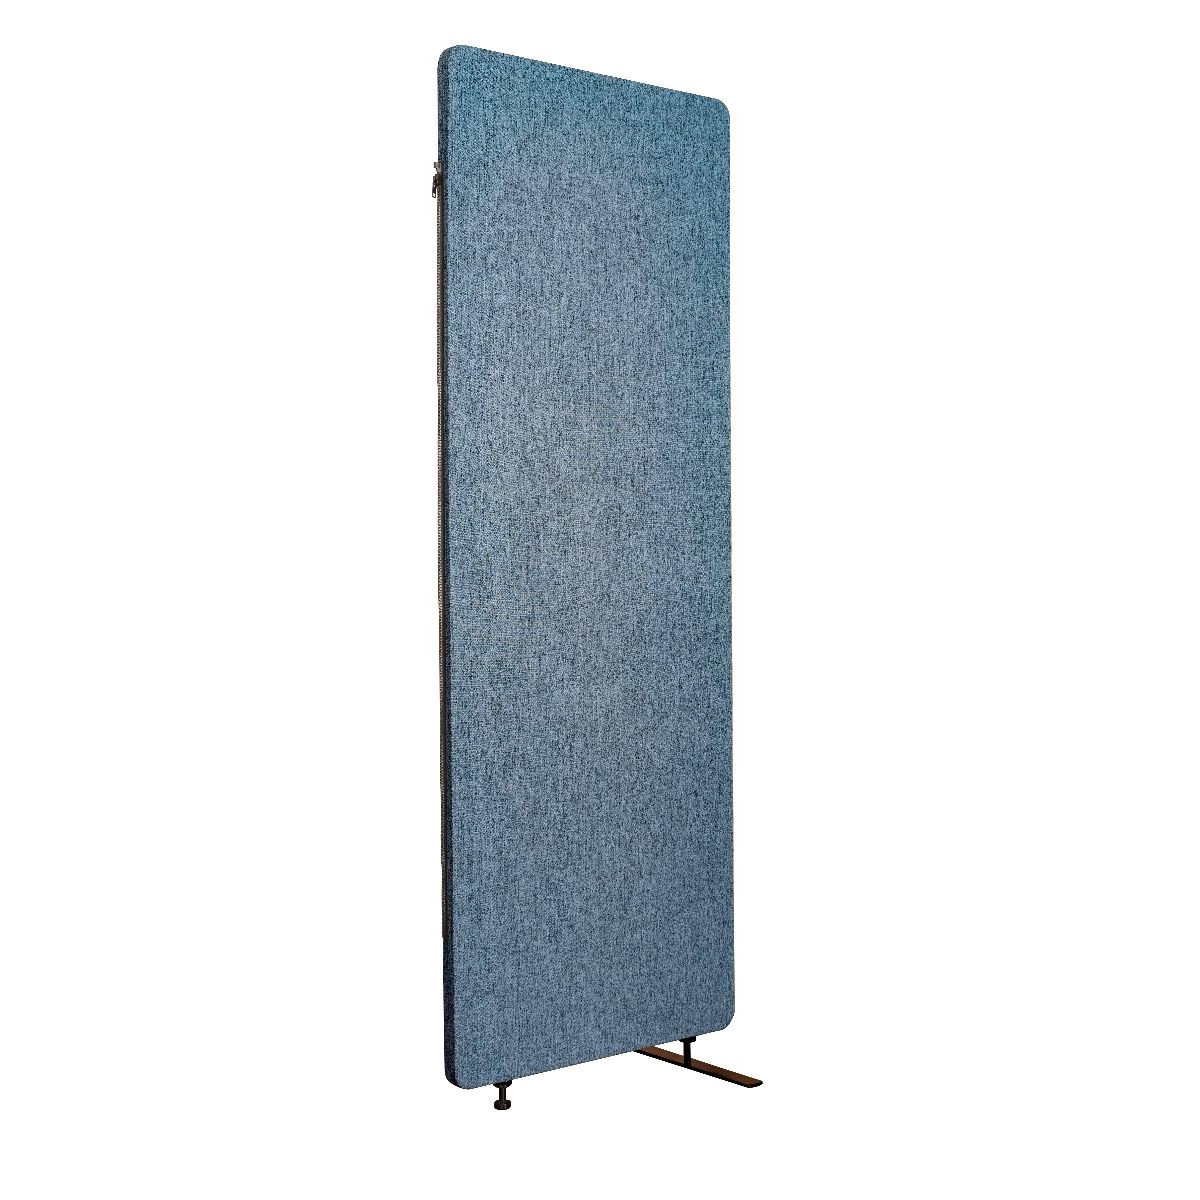 Single Panel Room Divider 66 H X 24 W